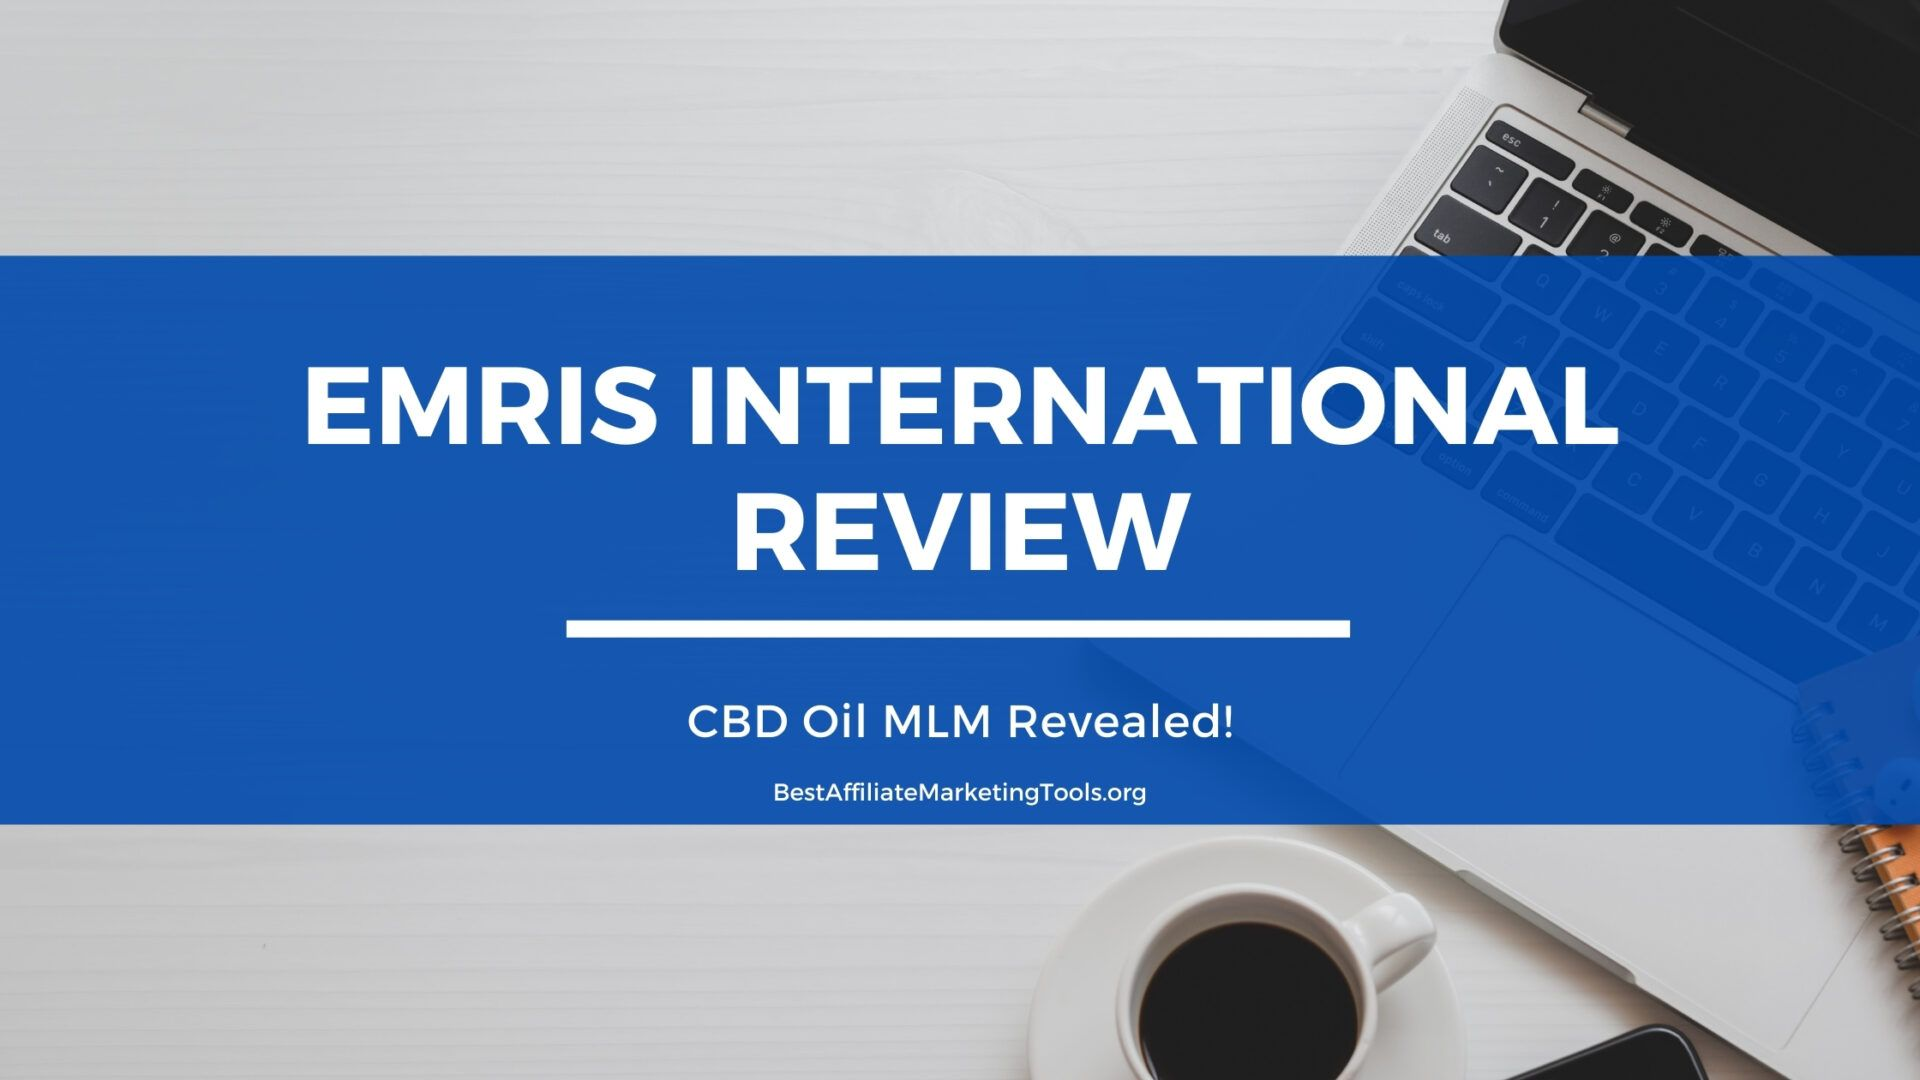 Emris International Review